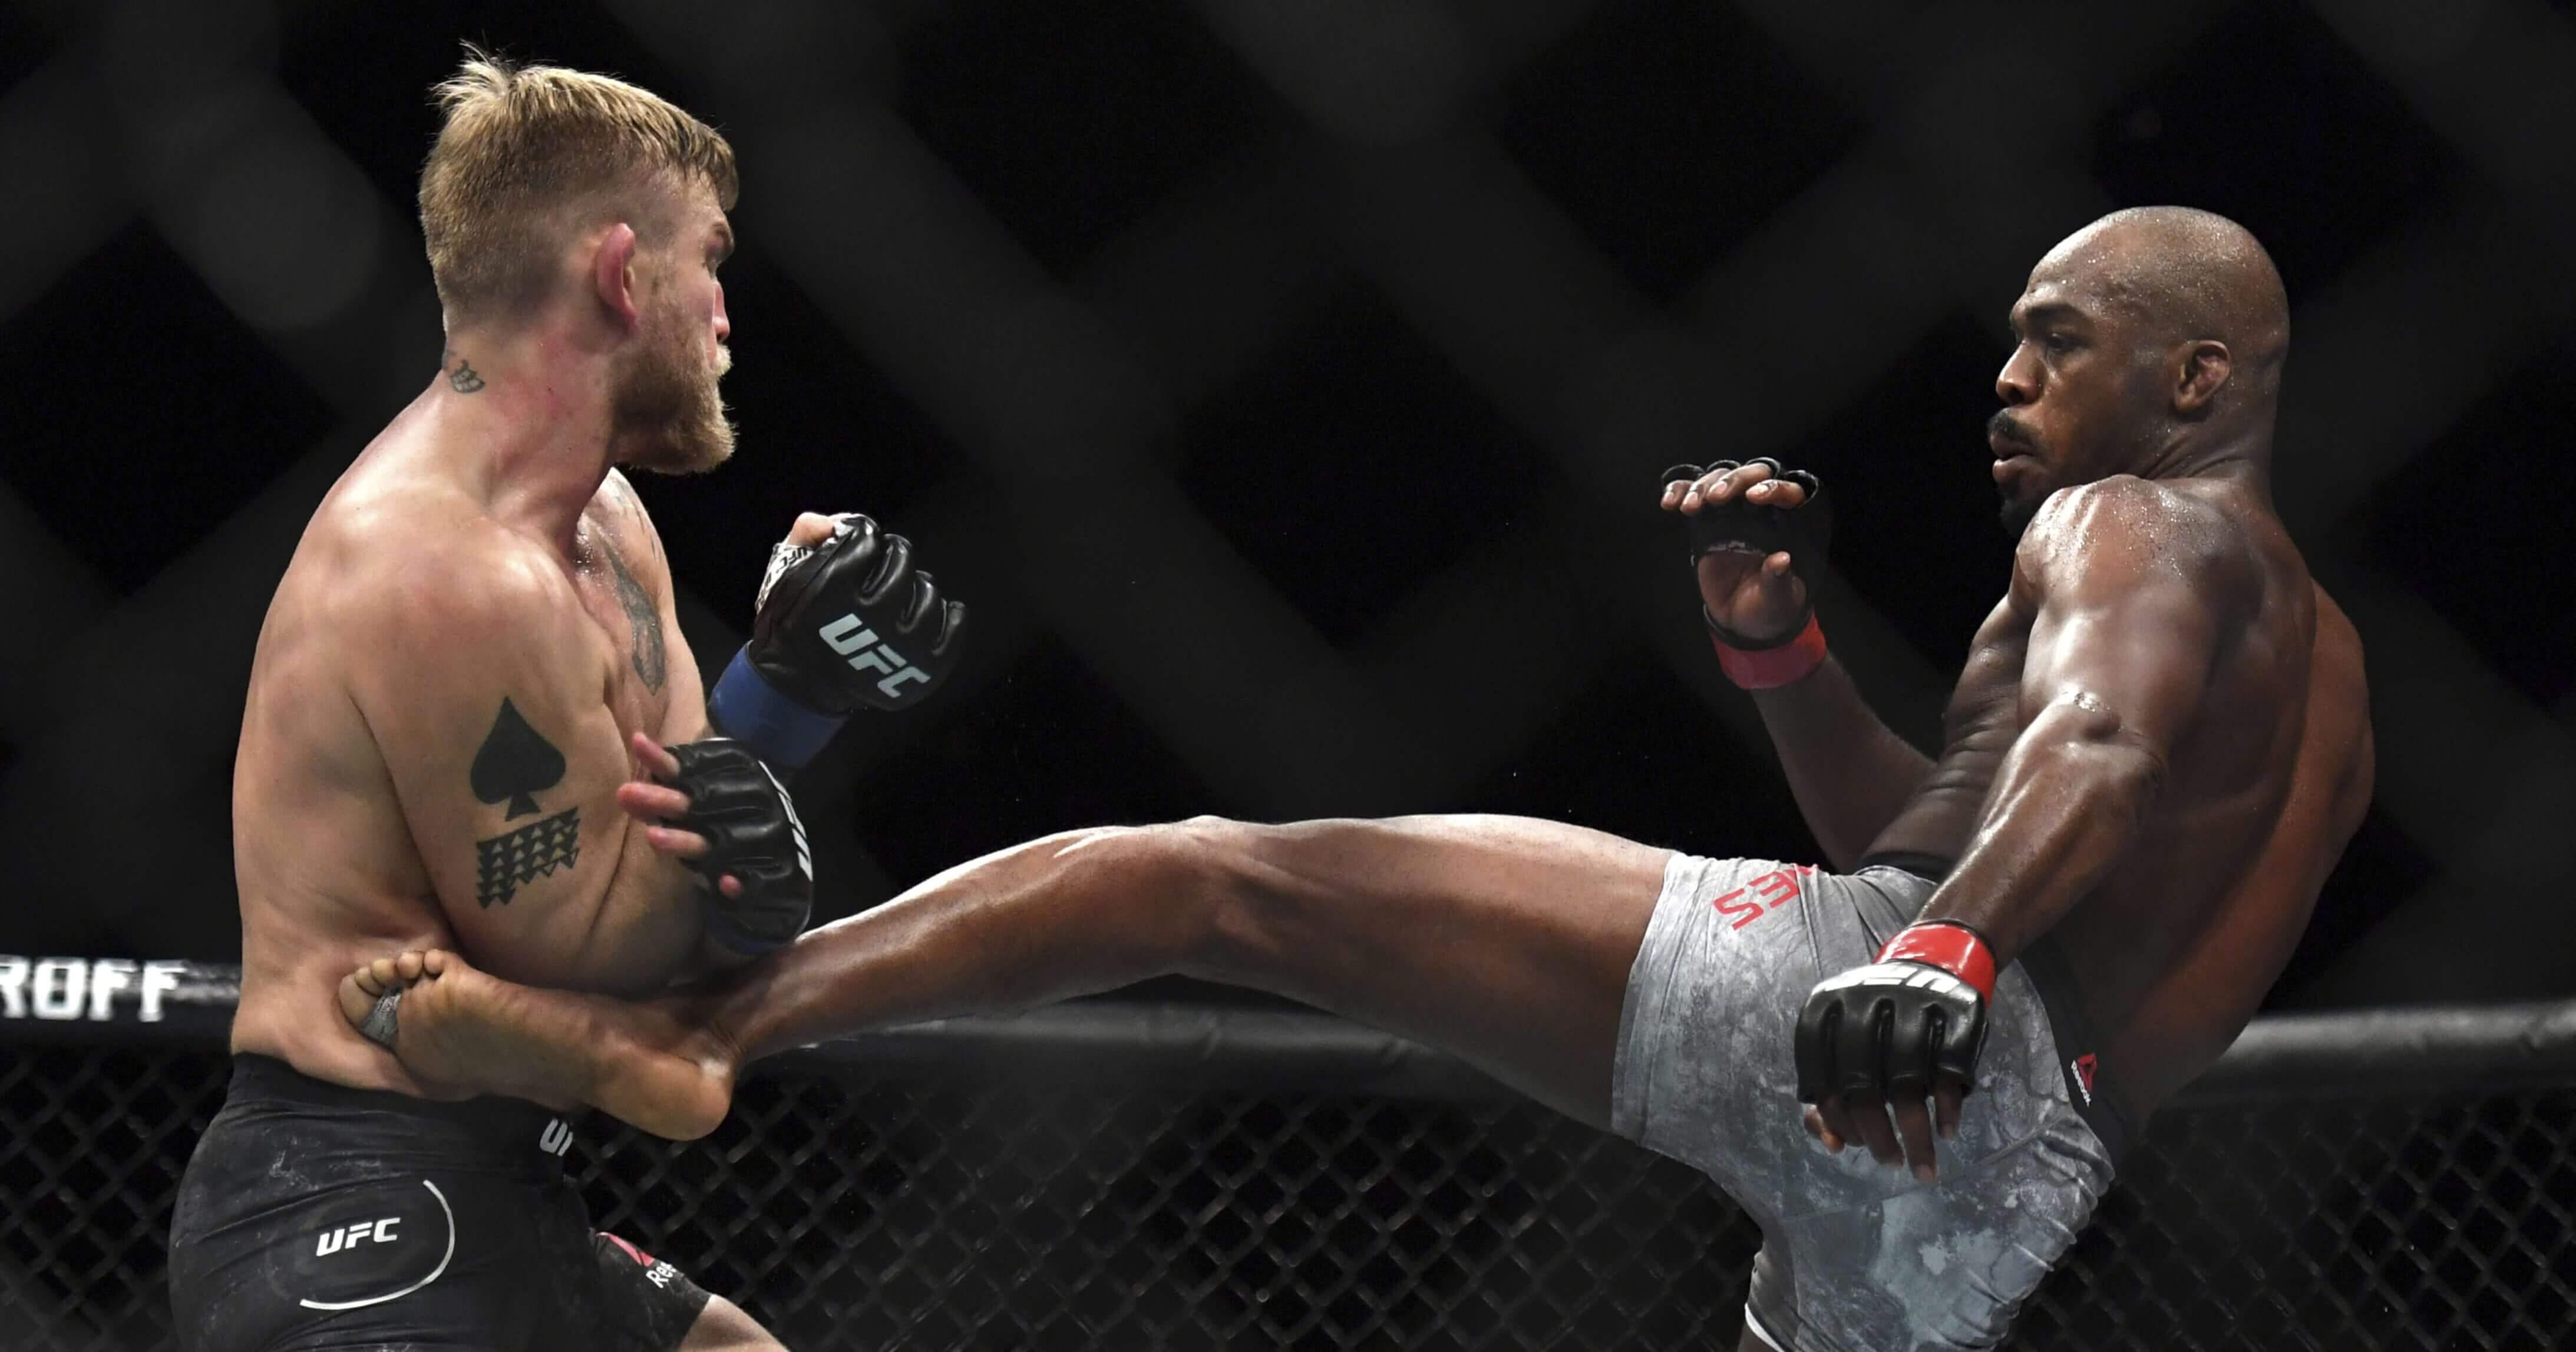 Jon Jones, right, lands a kick to Alexander Gustafsson during the UFC men's light heavyweight mixed martial arts bout Dec. 29 at UFC 232 in Inglewood, California.